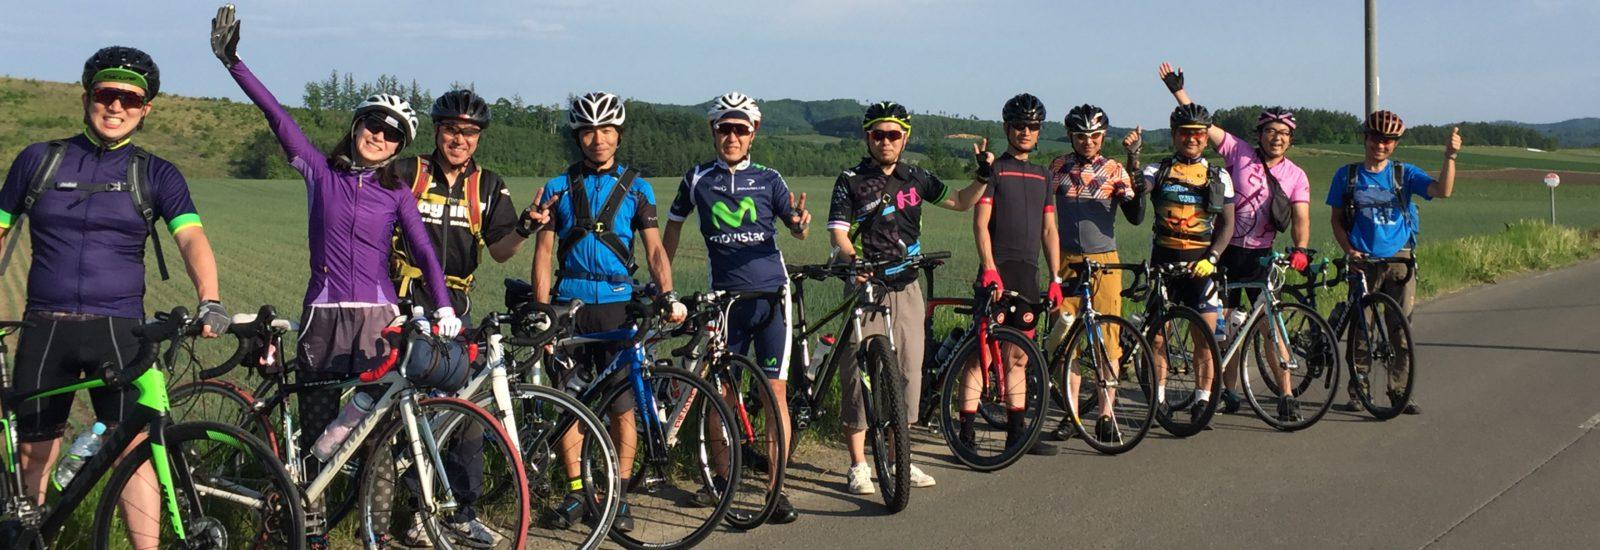 JCTA認定サイクリングインストラクター